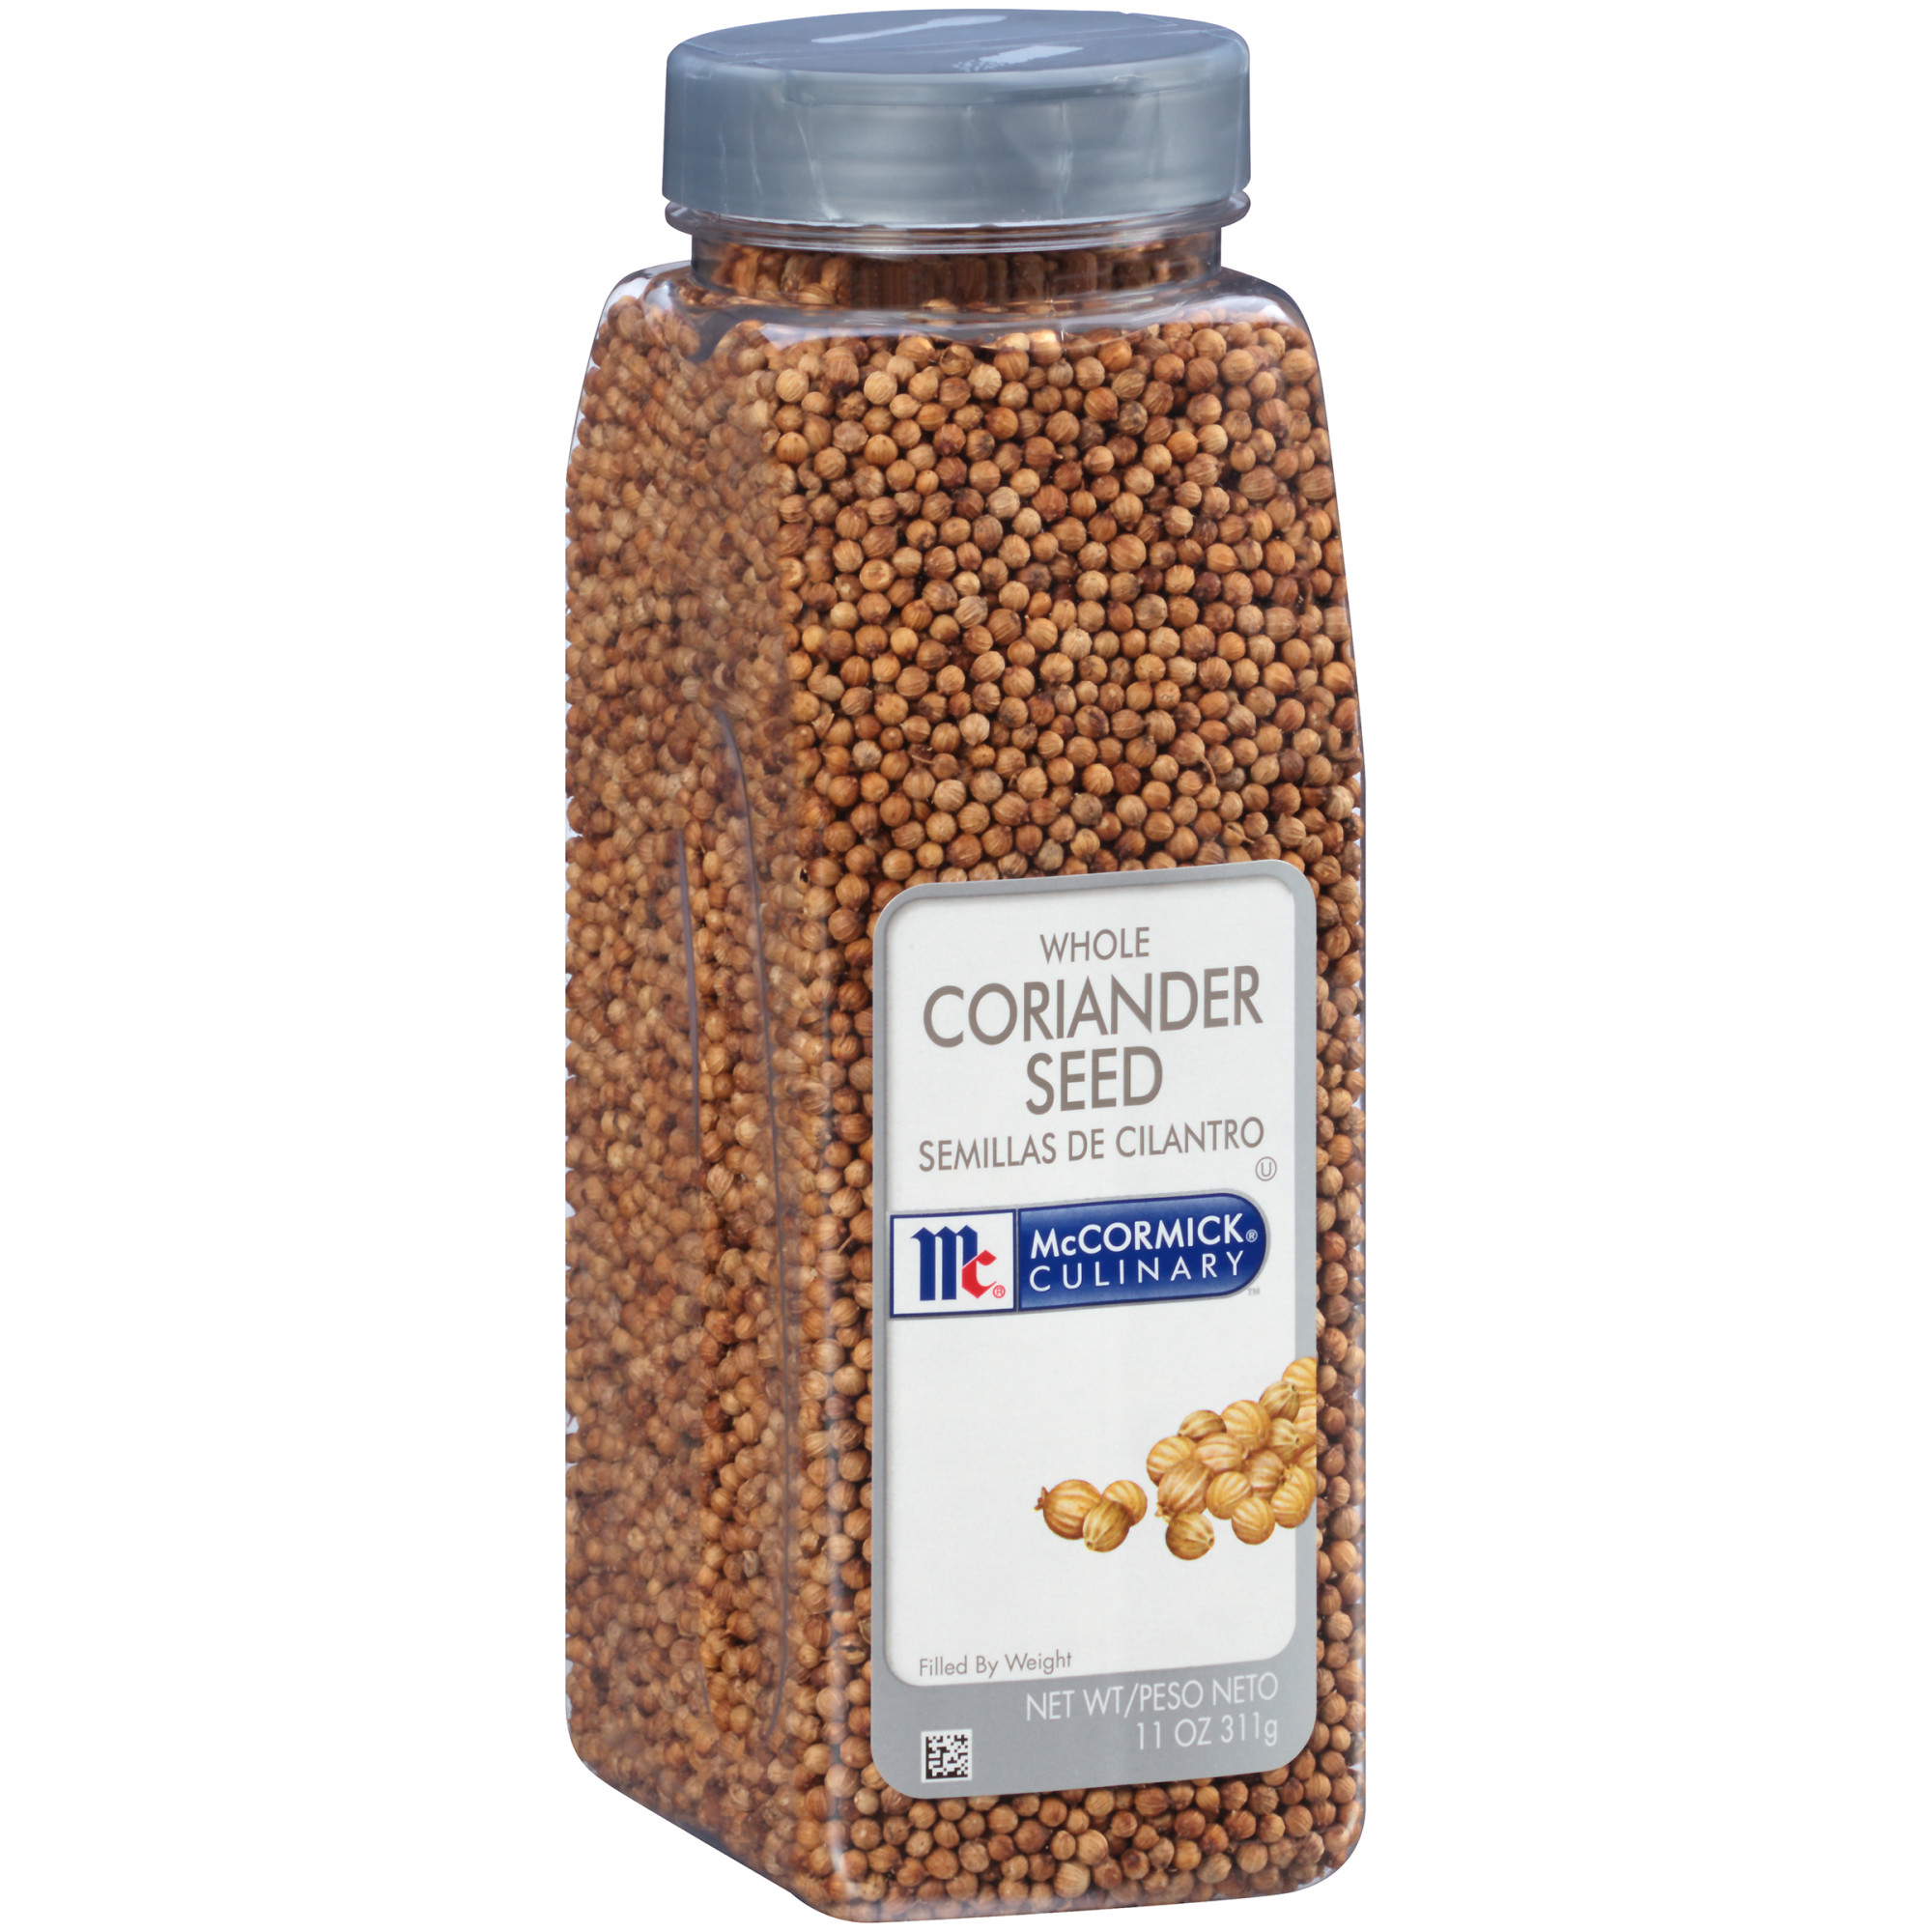 McCormick Culinary Whole Coriander Seed, 11 oz